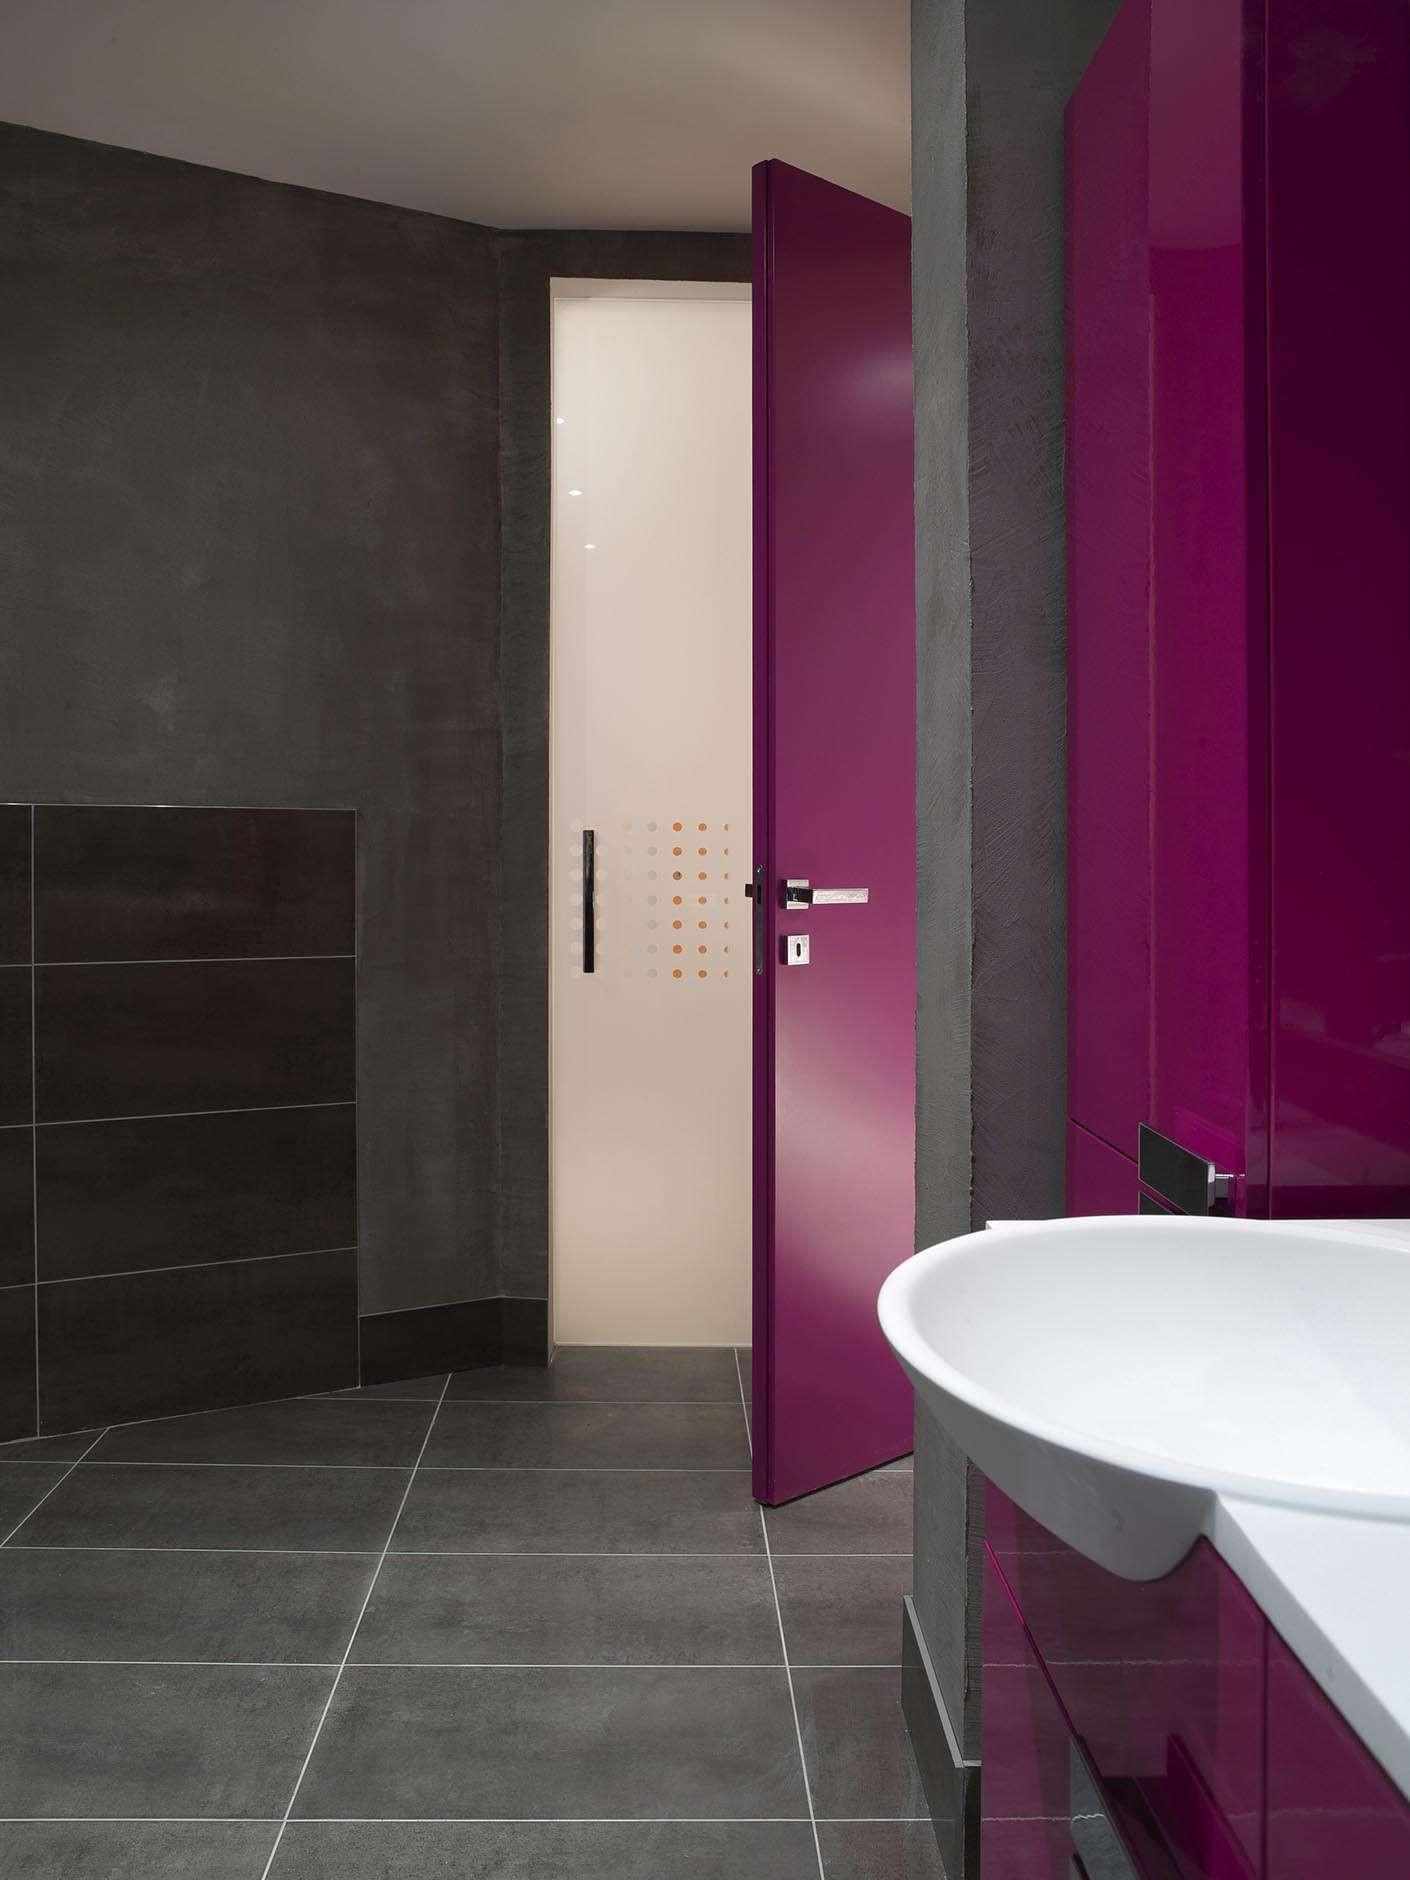 kleurrijke-deur-roze-glazen-binnendeur